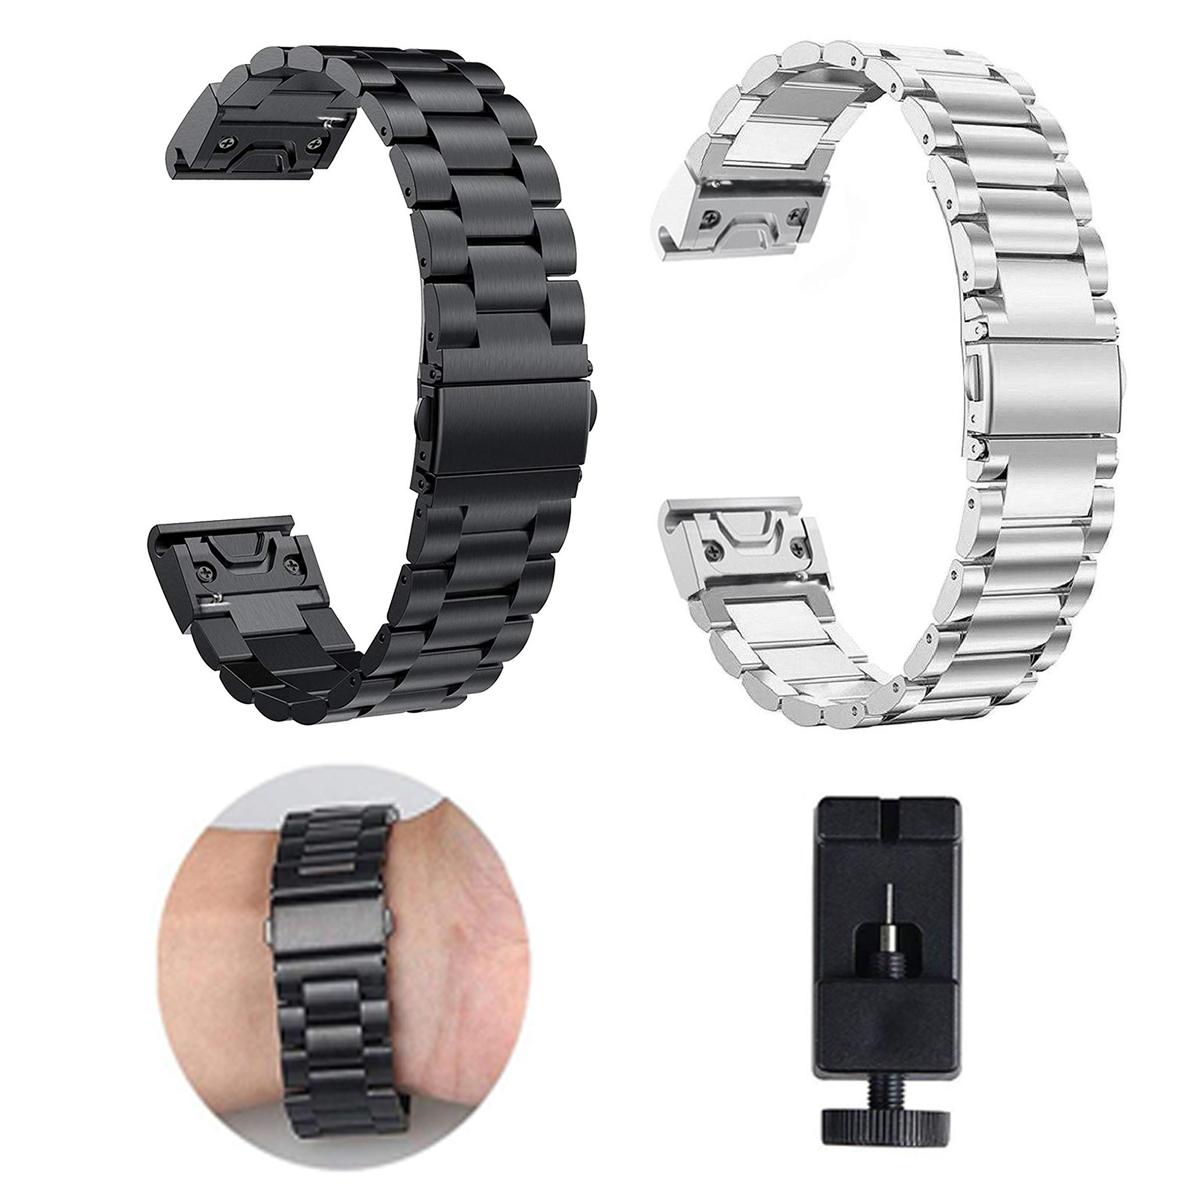 Silicone Replacement Fitness Wrist Band Bracelet Strap For Garmin Fenix5//5s//5x